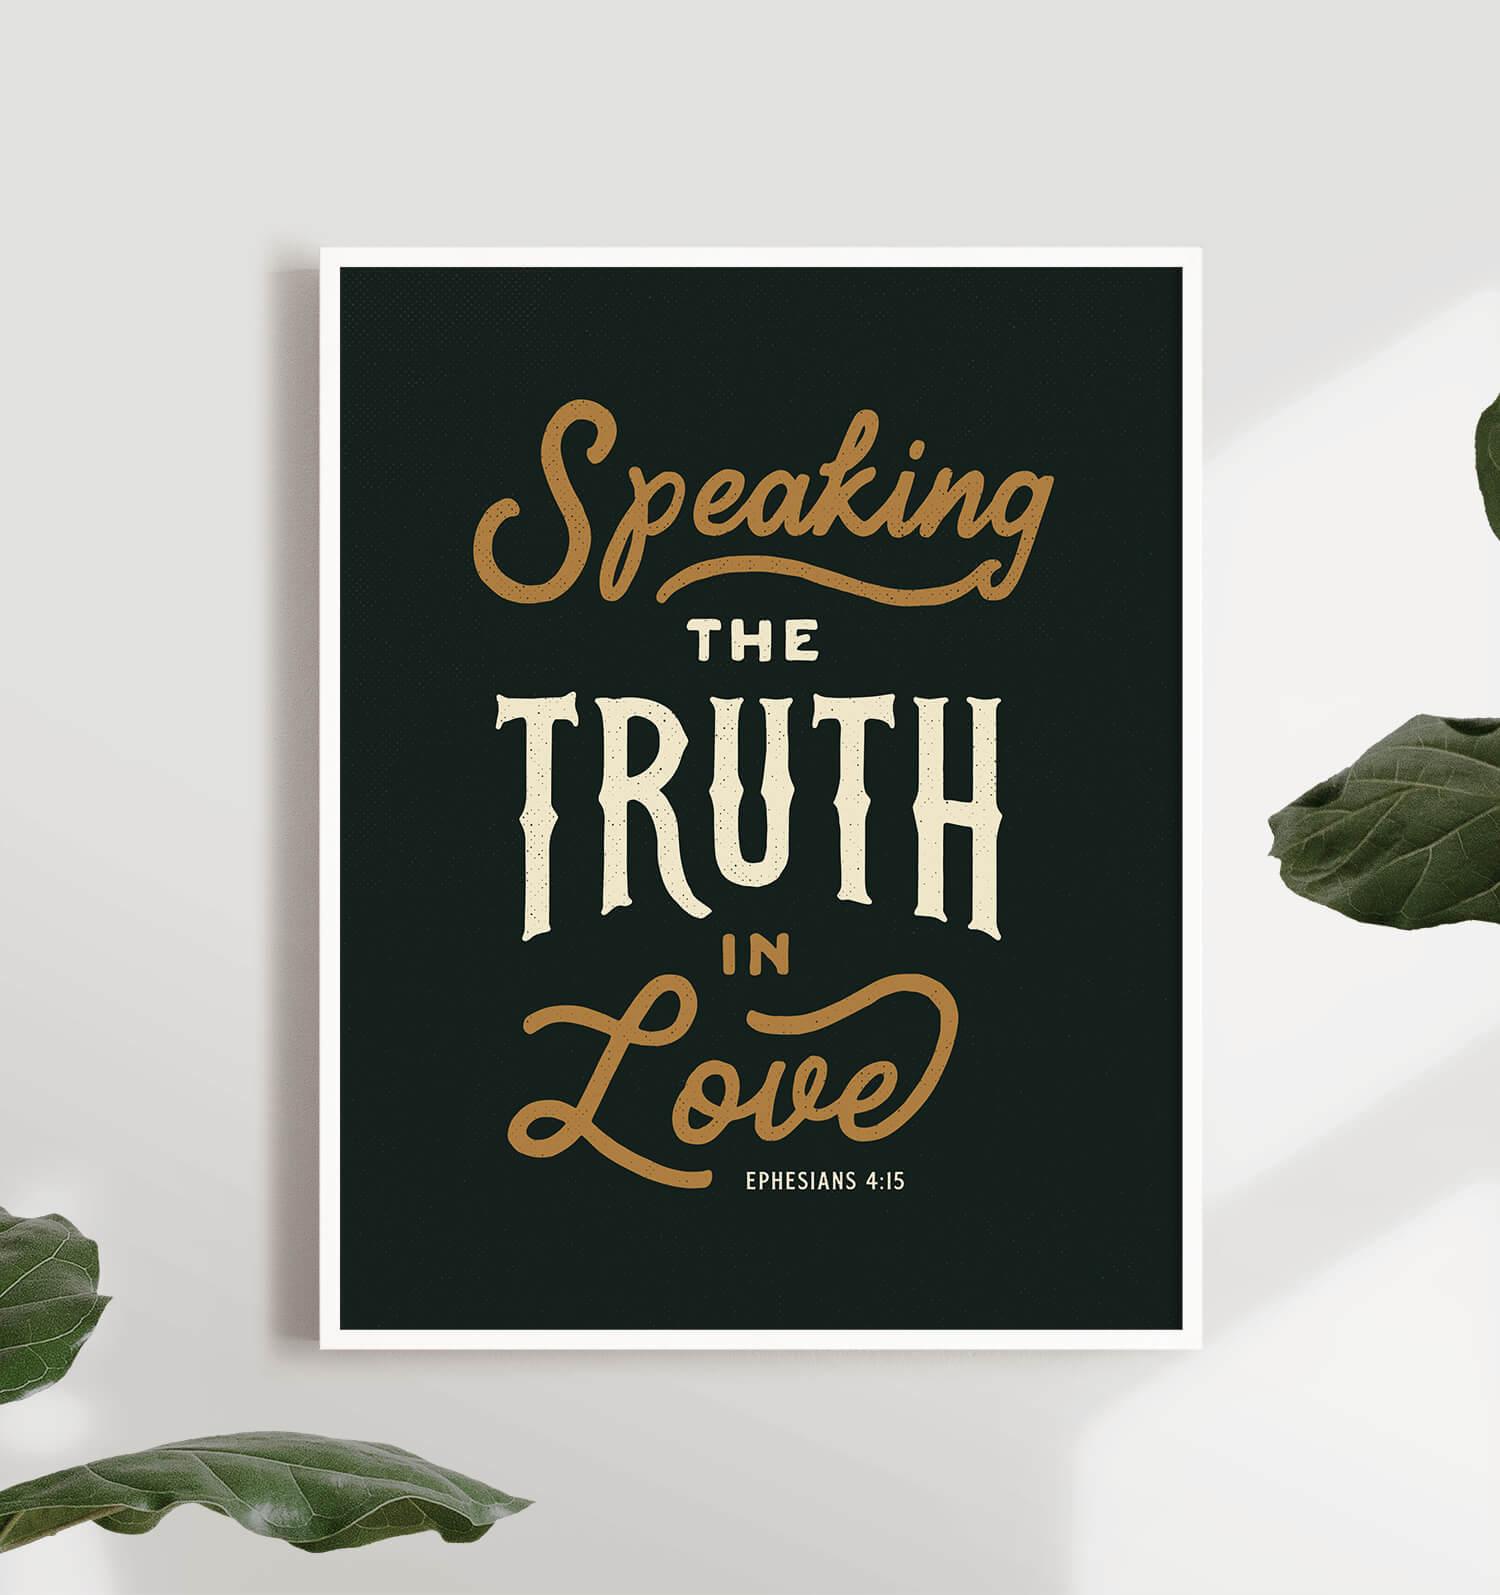 ScriptureType-Ephesians-4-15.jpg